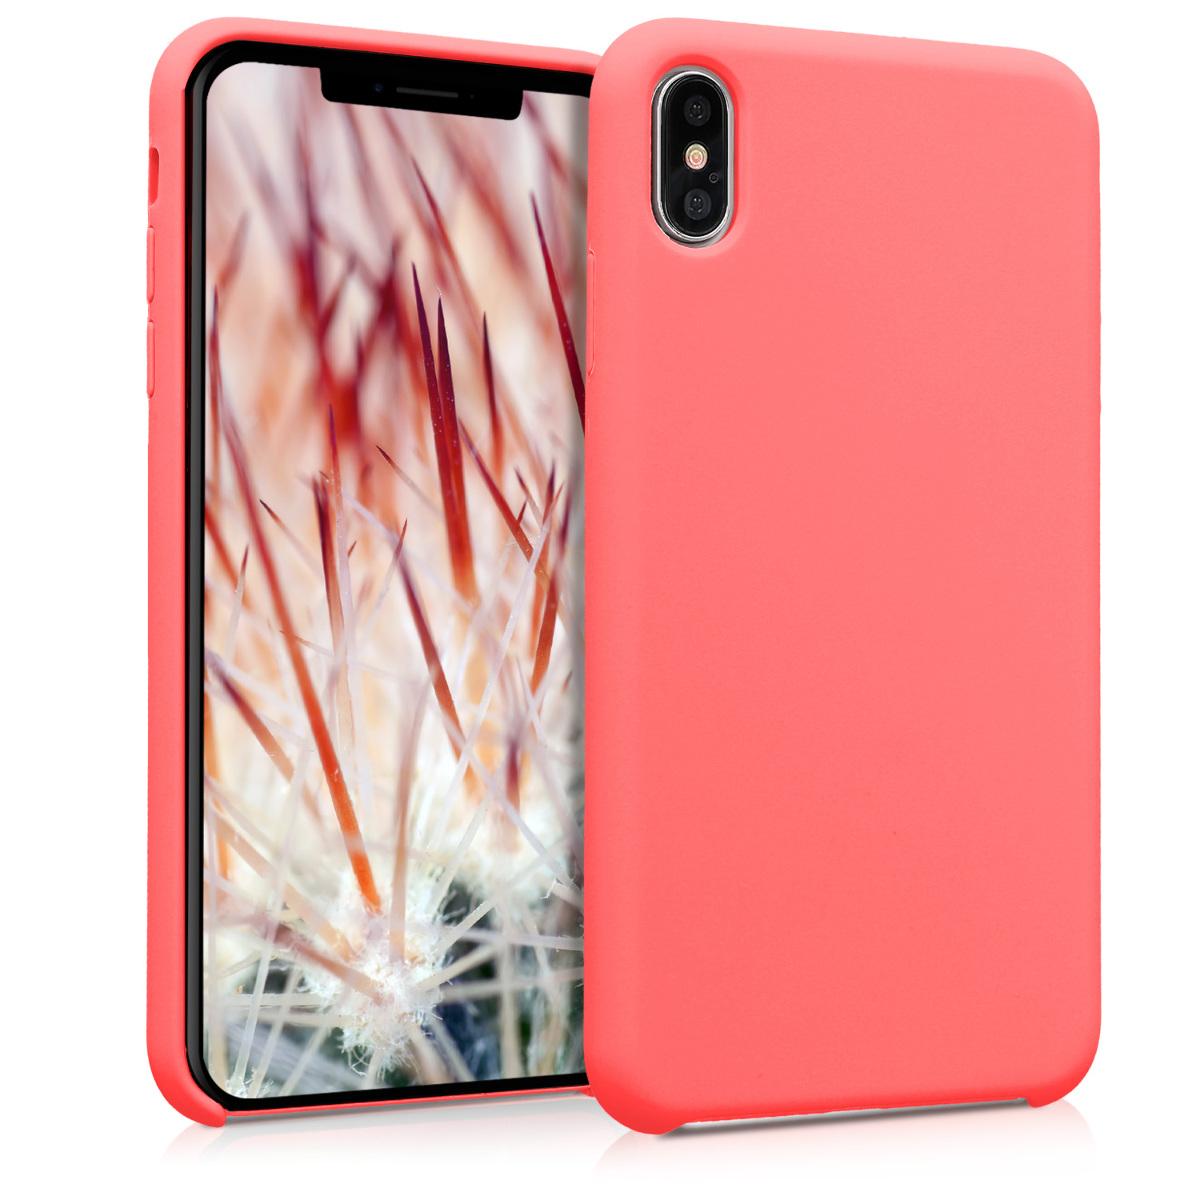 Kvalitní silikonové TPU pouzdro pro Apple iPhone XS Max - Neon Coral